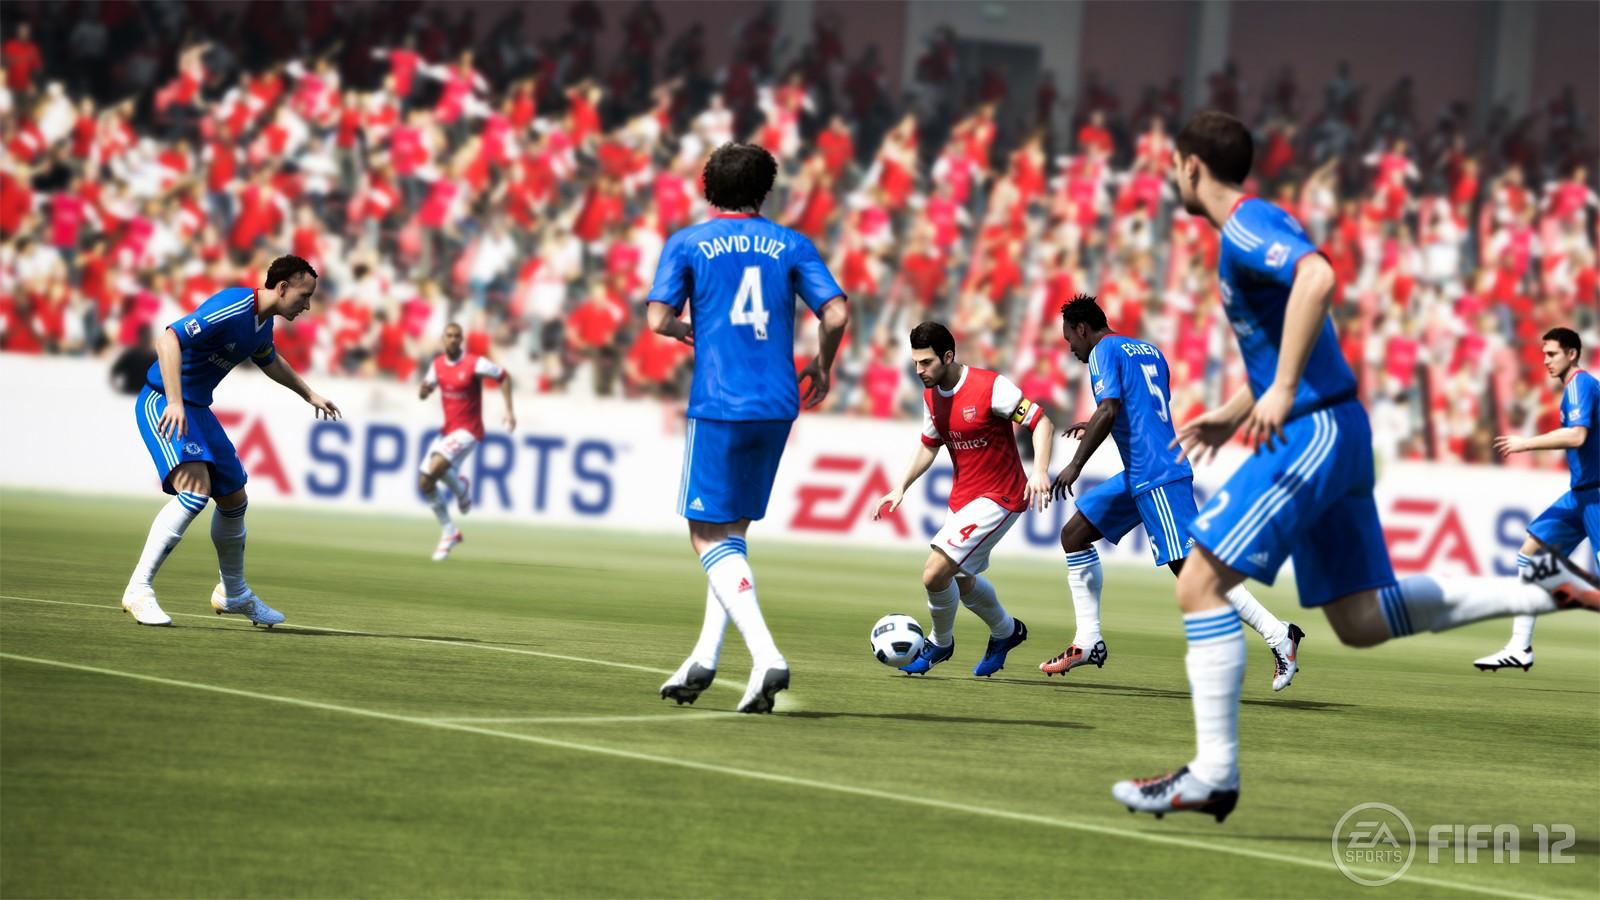 Taktischere Tacklings, präzisiere Dribblings - FIFA 12 fühlt sich freier an.